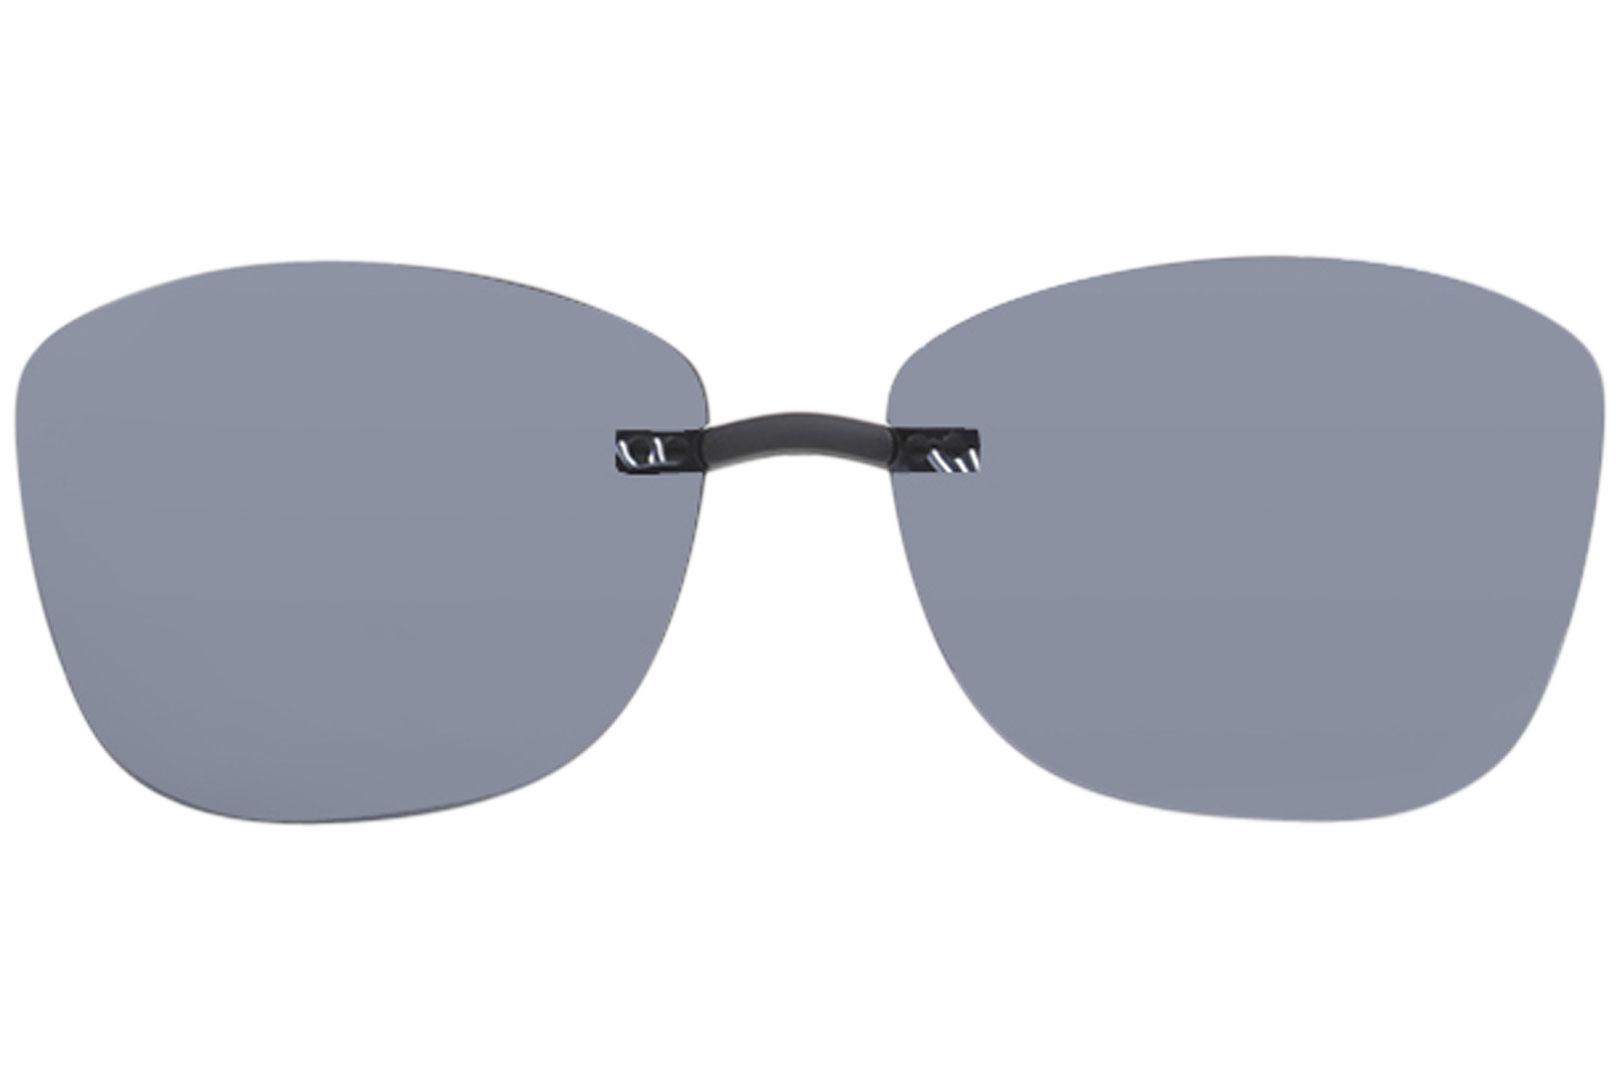 b0033102b73 Silhouette Sunglasses Clip-On 5090 A2 Shape 0701 Polarized Blue-Gray ...